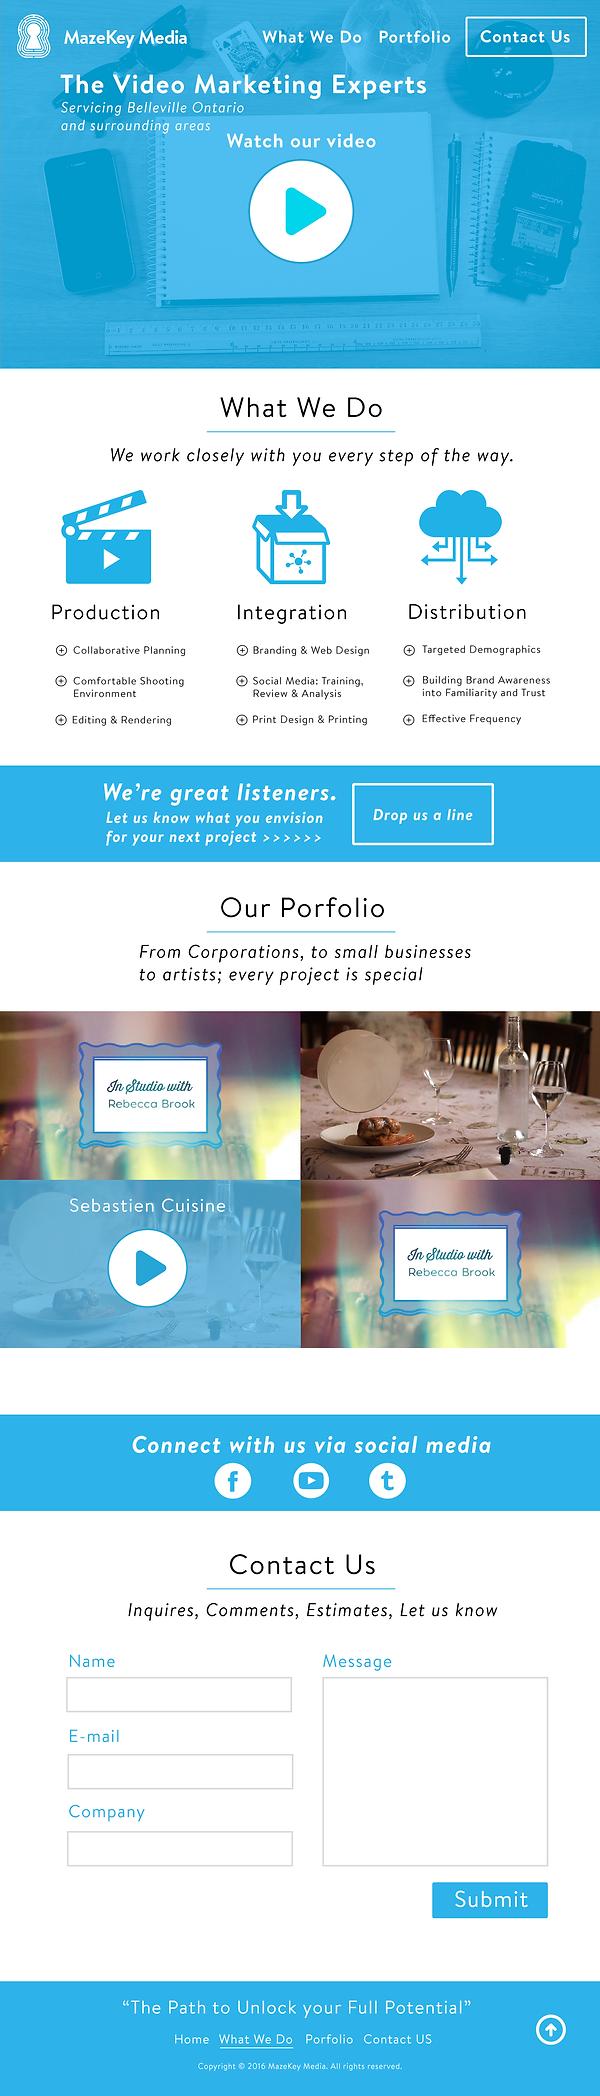 Mazekey Media Website Design 2016